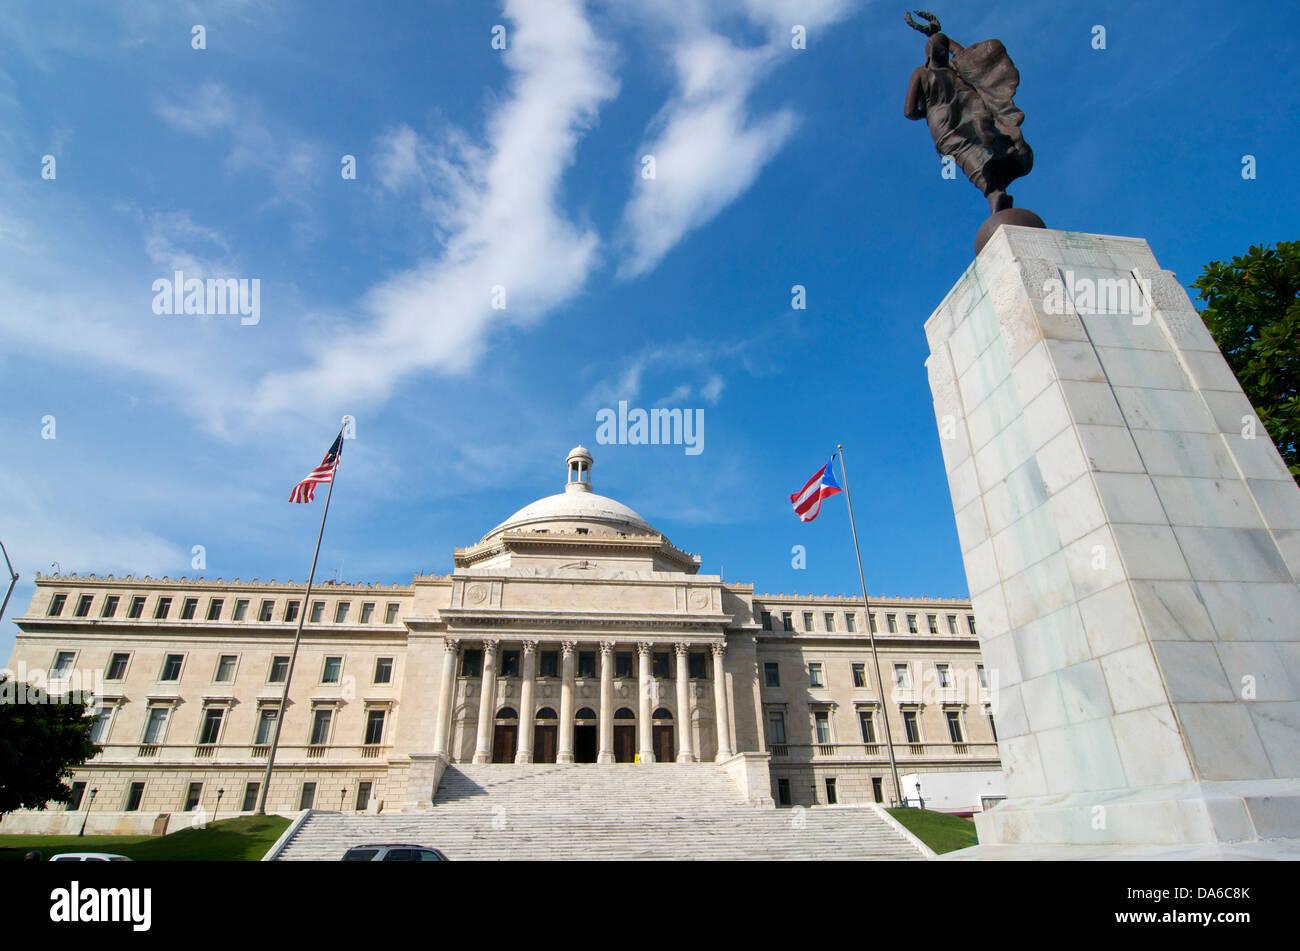 Puerto Rico, Caribbean, Greater Antilles, Antilles, Capitol, government, building, construction, architecture, parliament, - Stock Image